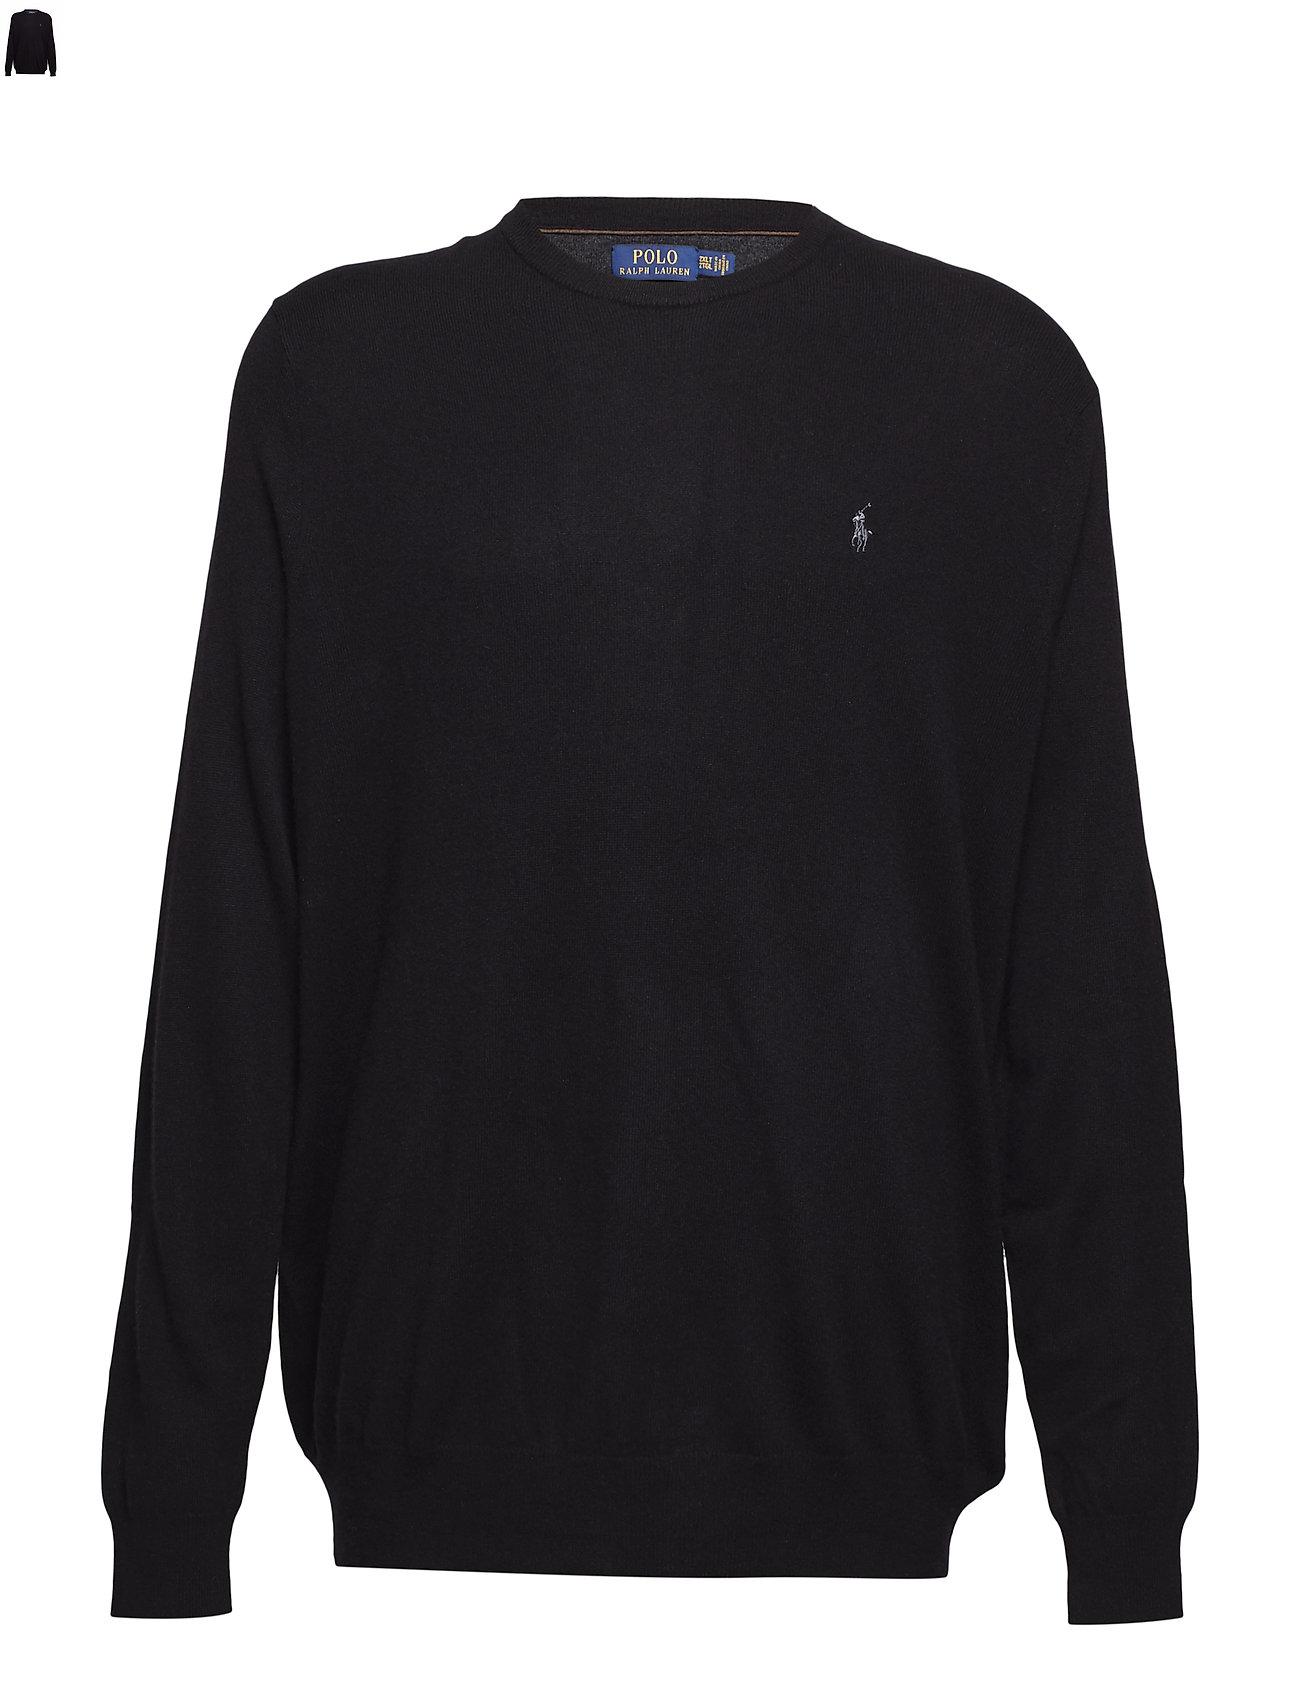 15f4b08d3a3 Merino Wool Crewneck Sweater (Polo Black) (£81) - Polo Ralph Lauren ...